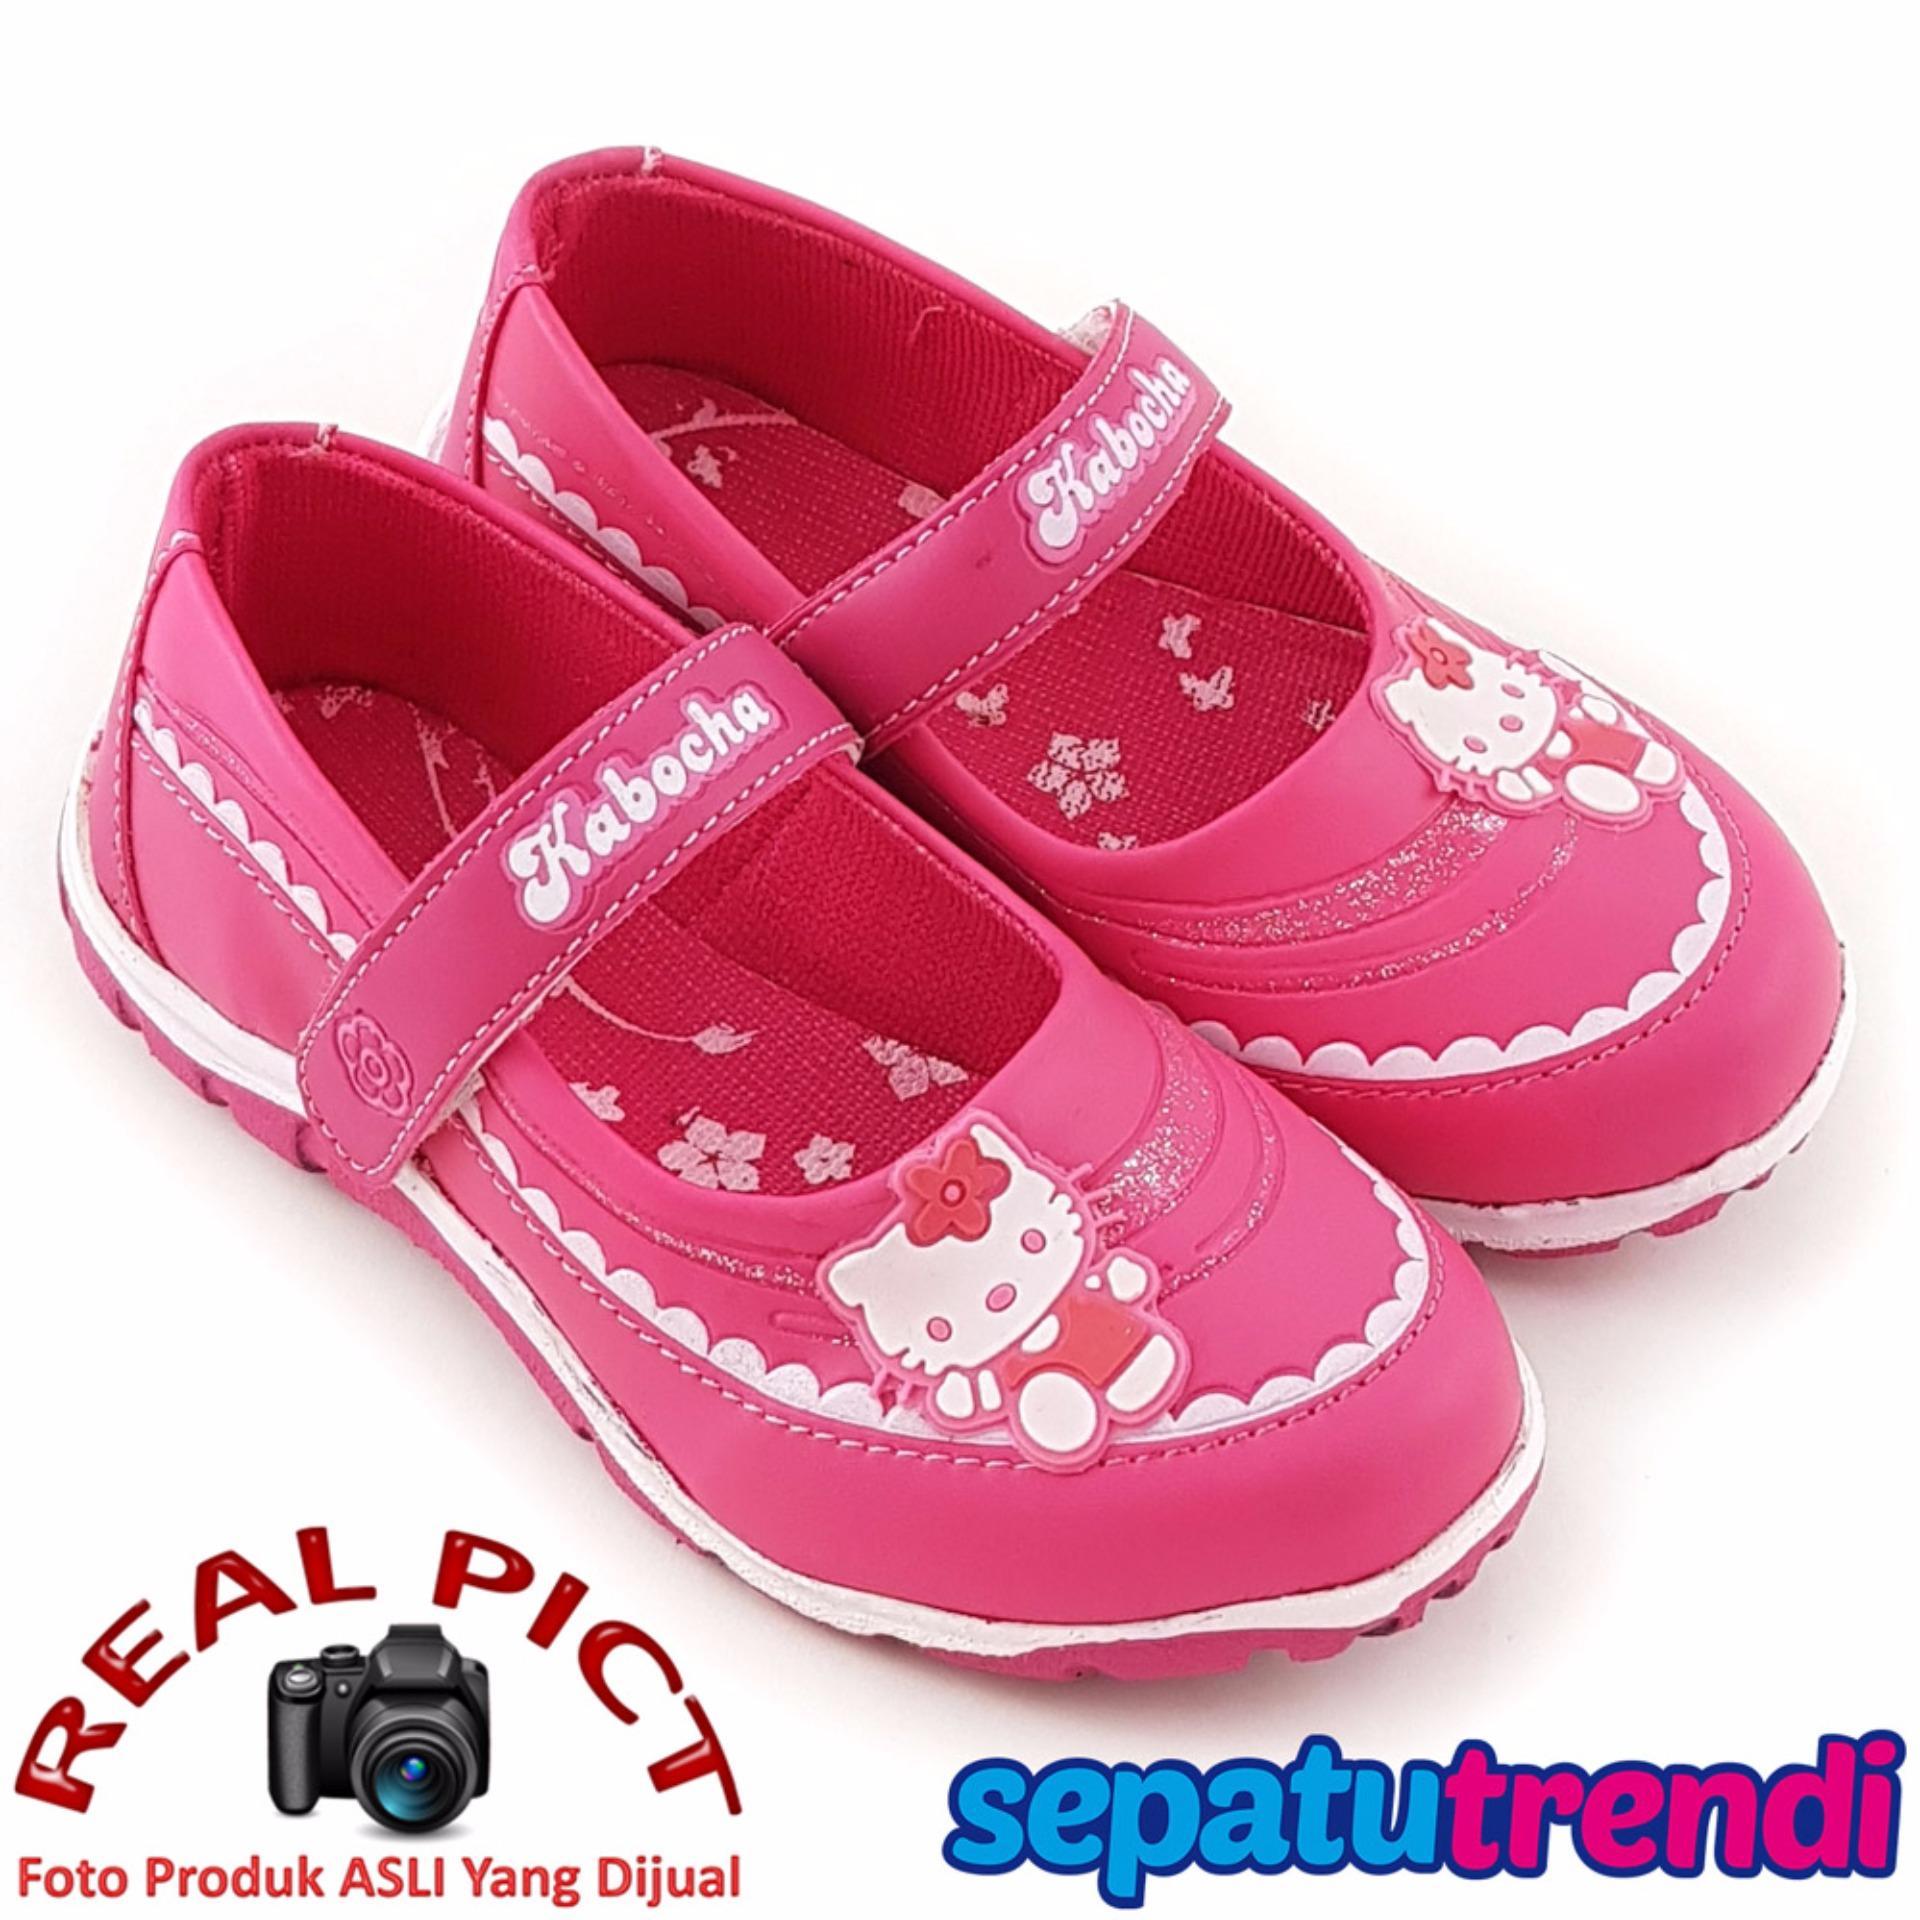 Spesifikasi Trendishoes Sepatu Sekolah Anak Perempuan Cantik Kb021 Fuchsia Lengkap